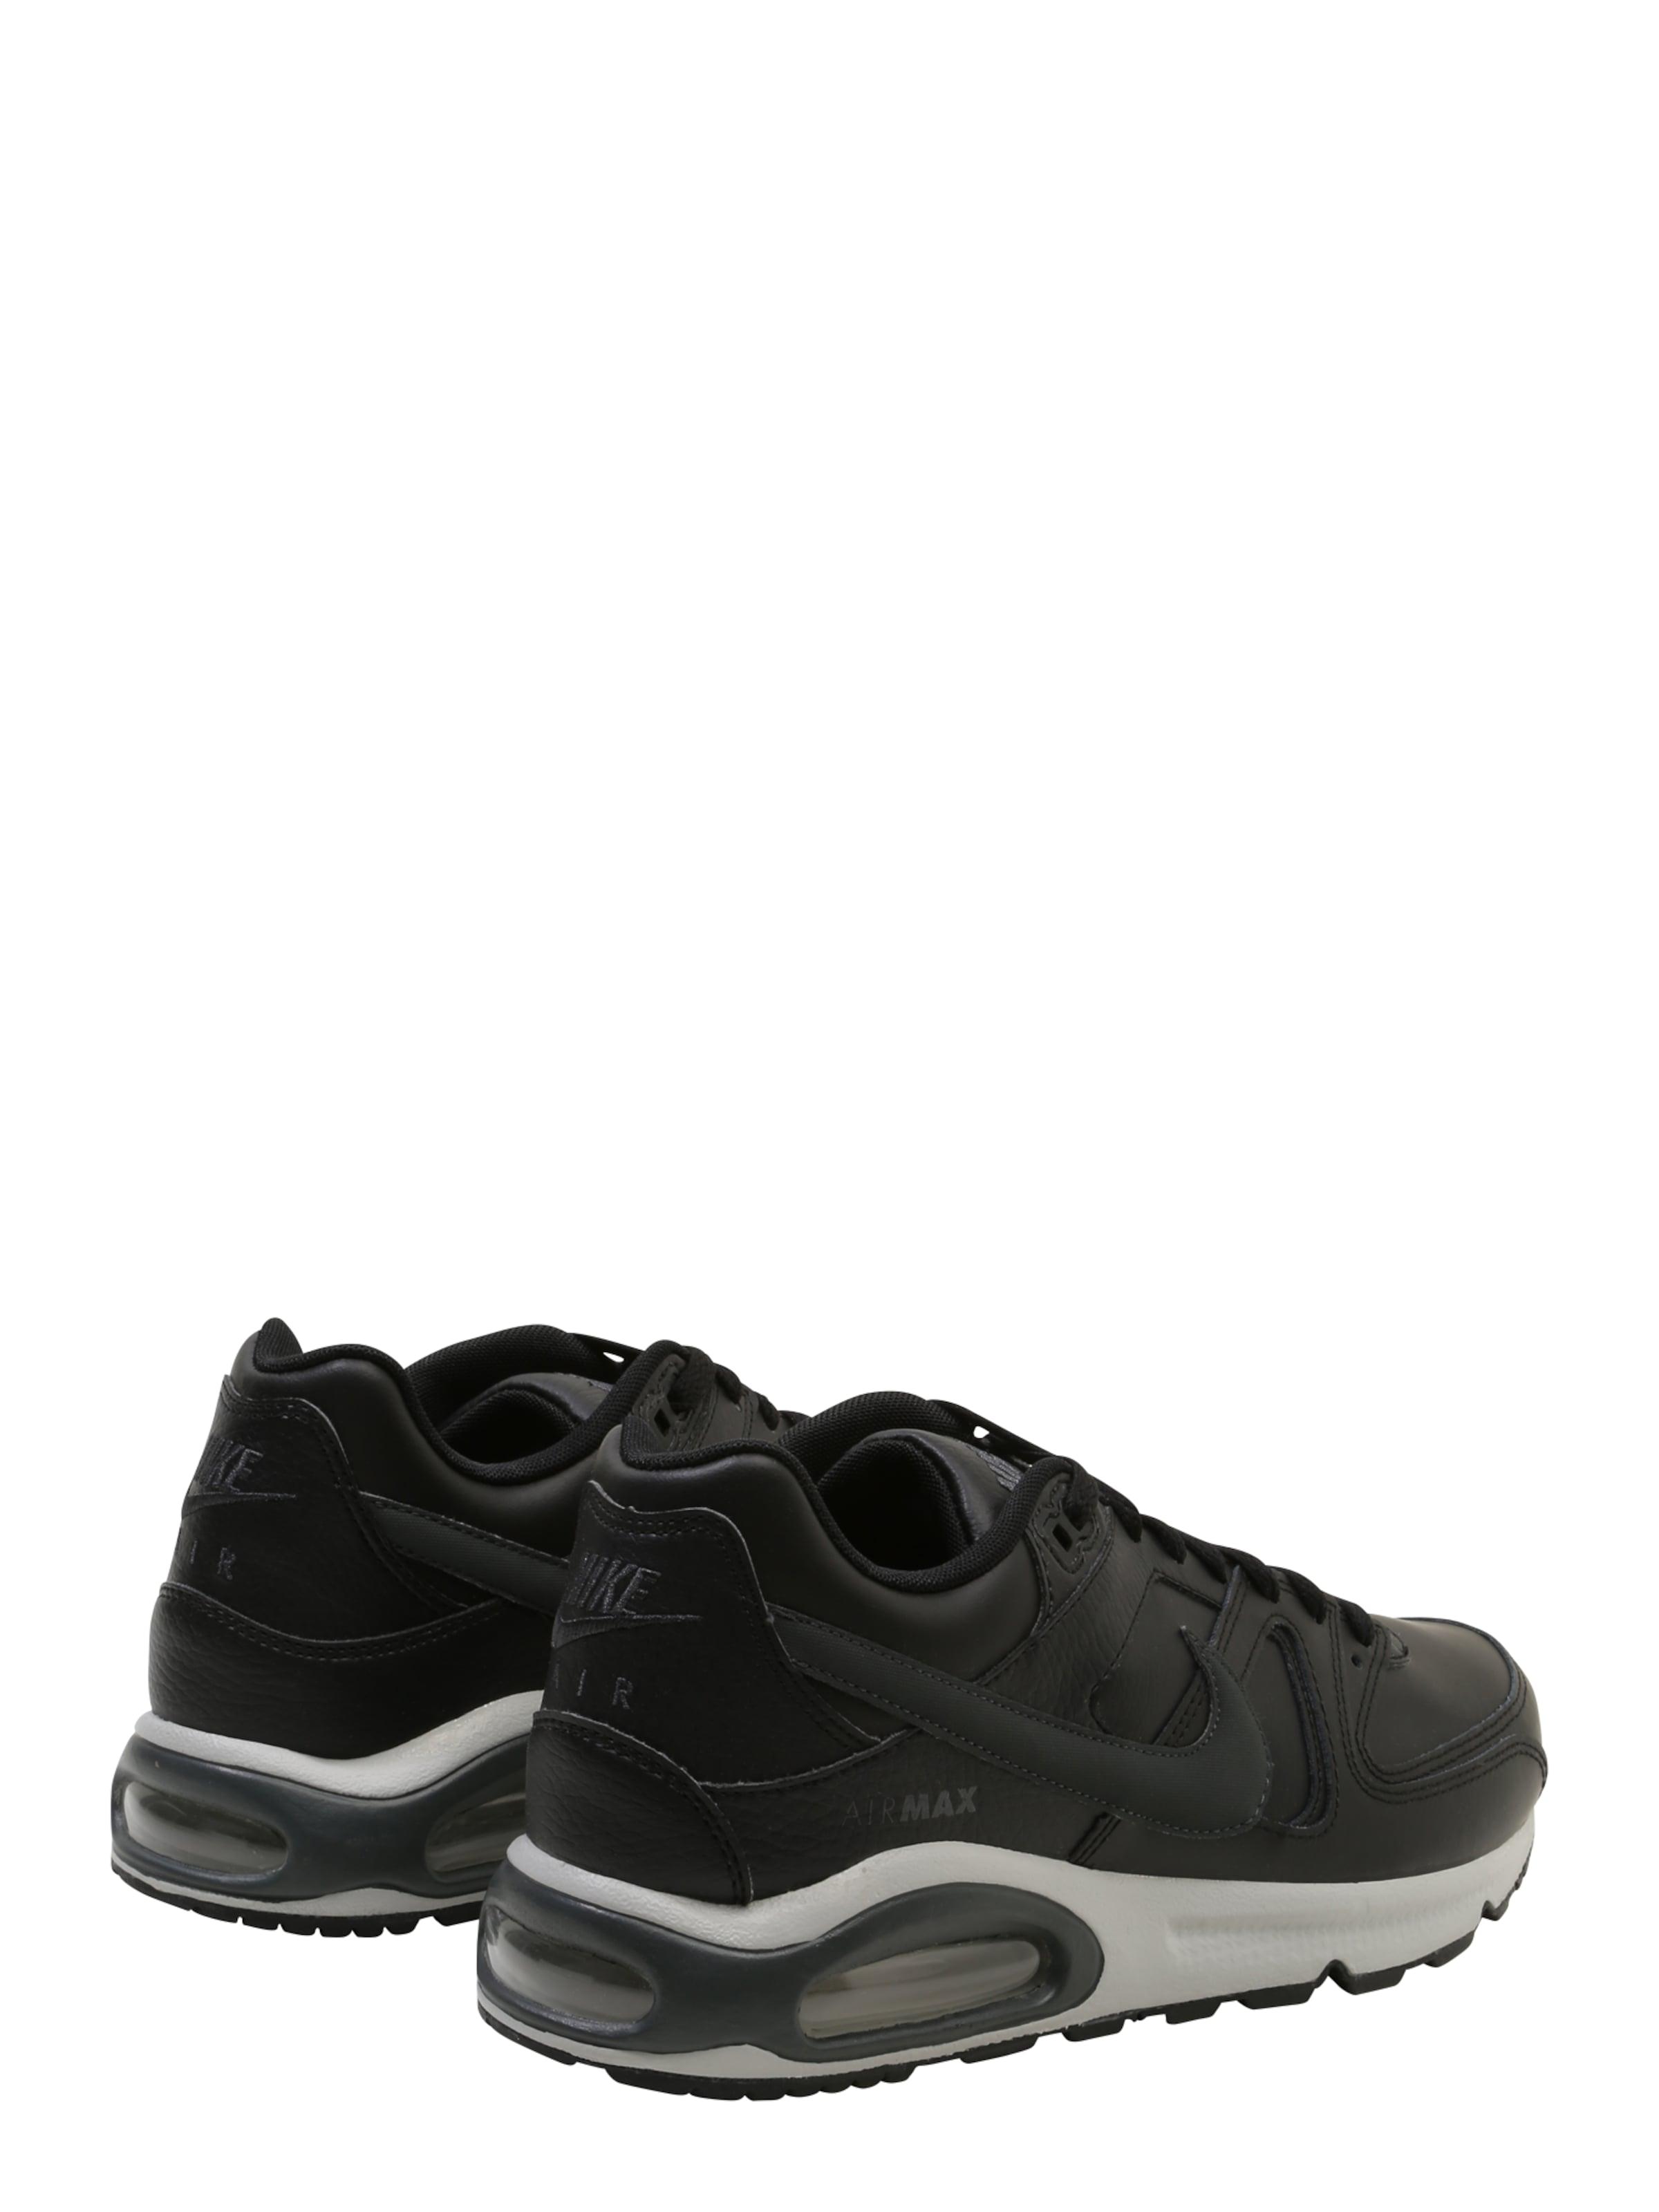 Nike Sportswear Turnschuhe Turnschuhe Turnschuhe 'Air Max Command Leder Markenrabatt 1b371b